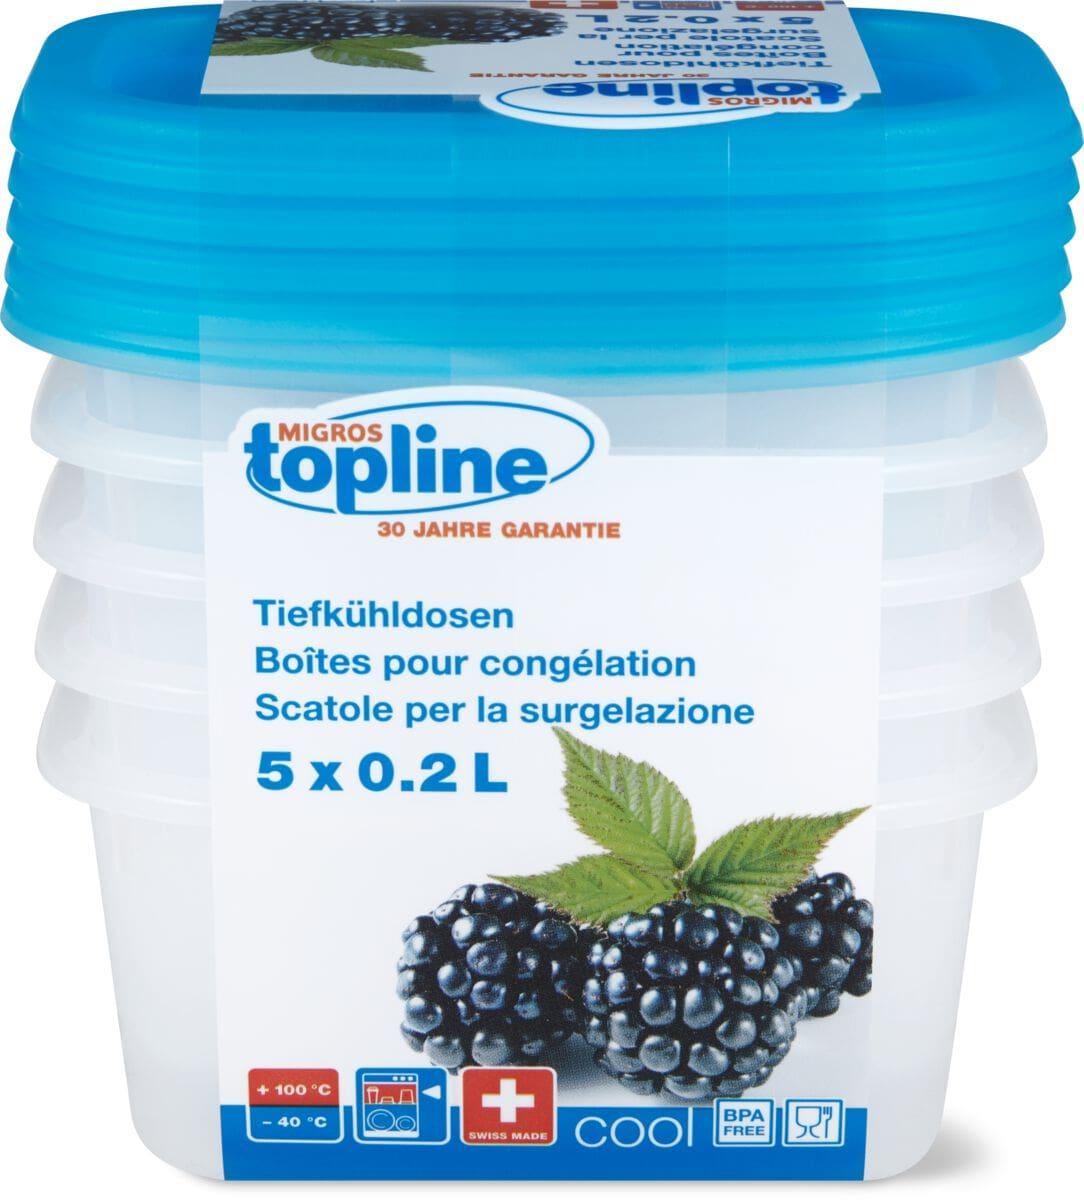 M-Topline COOL Tiefkühldose 0.2L